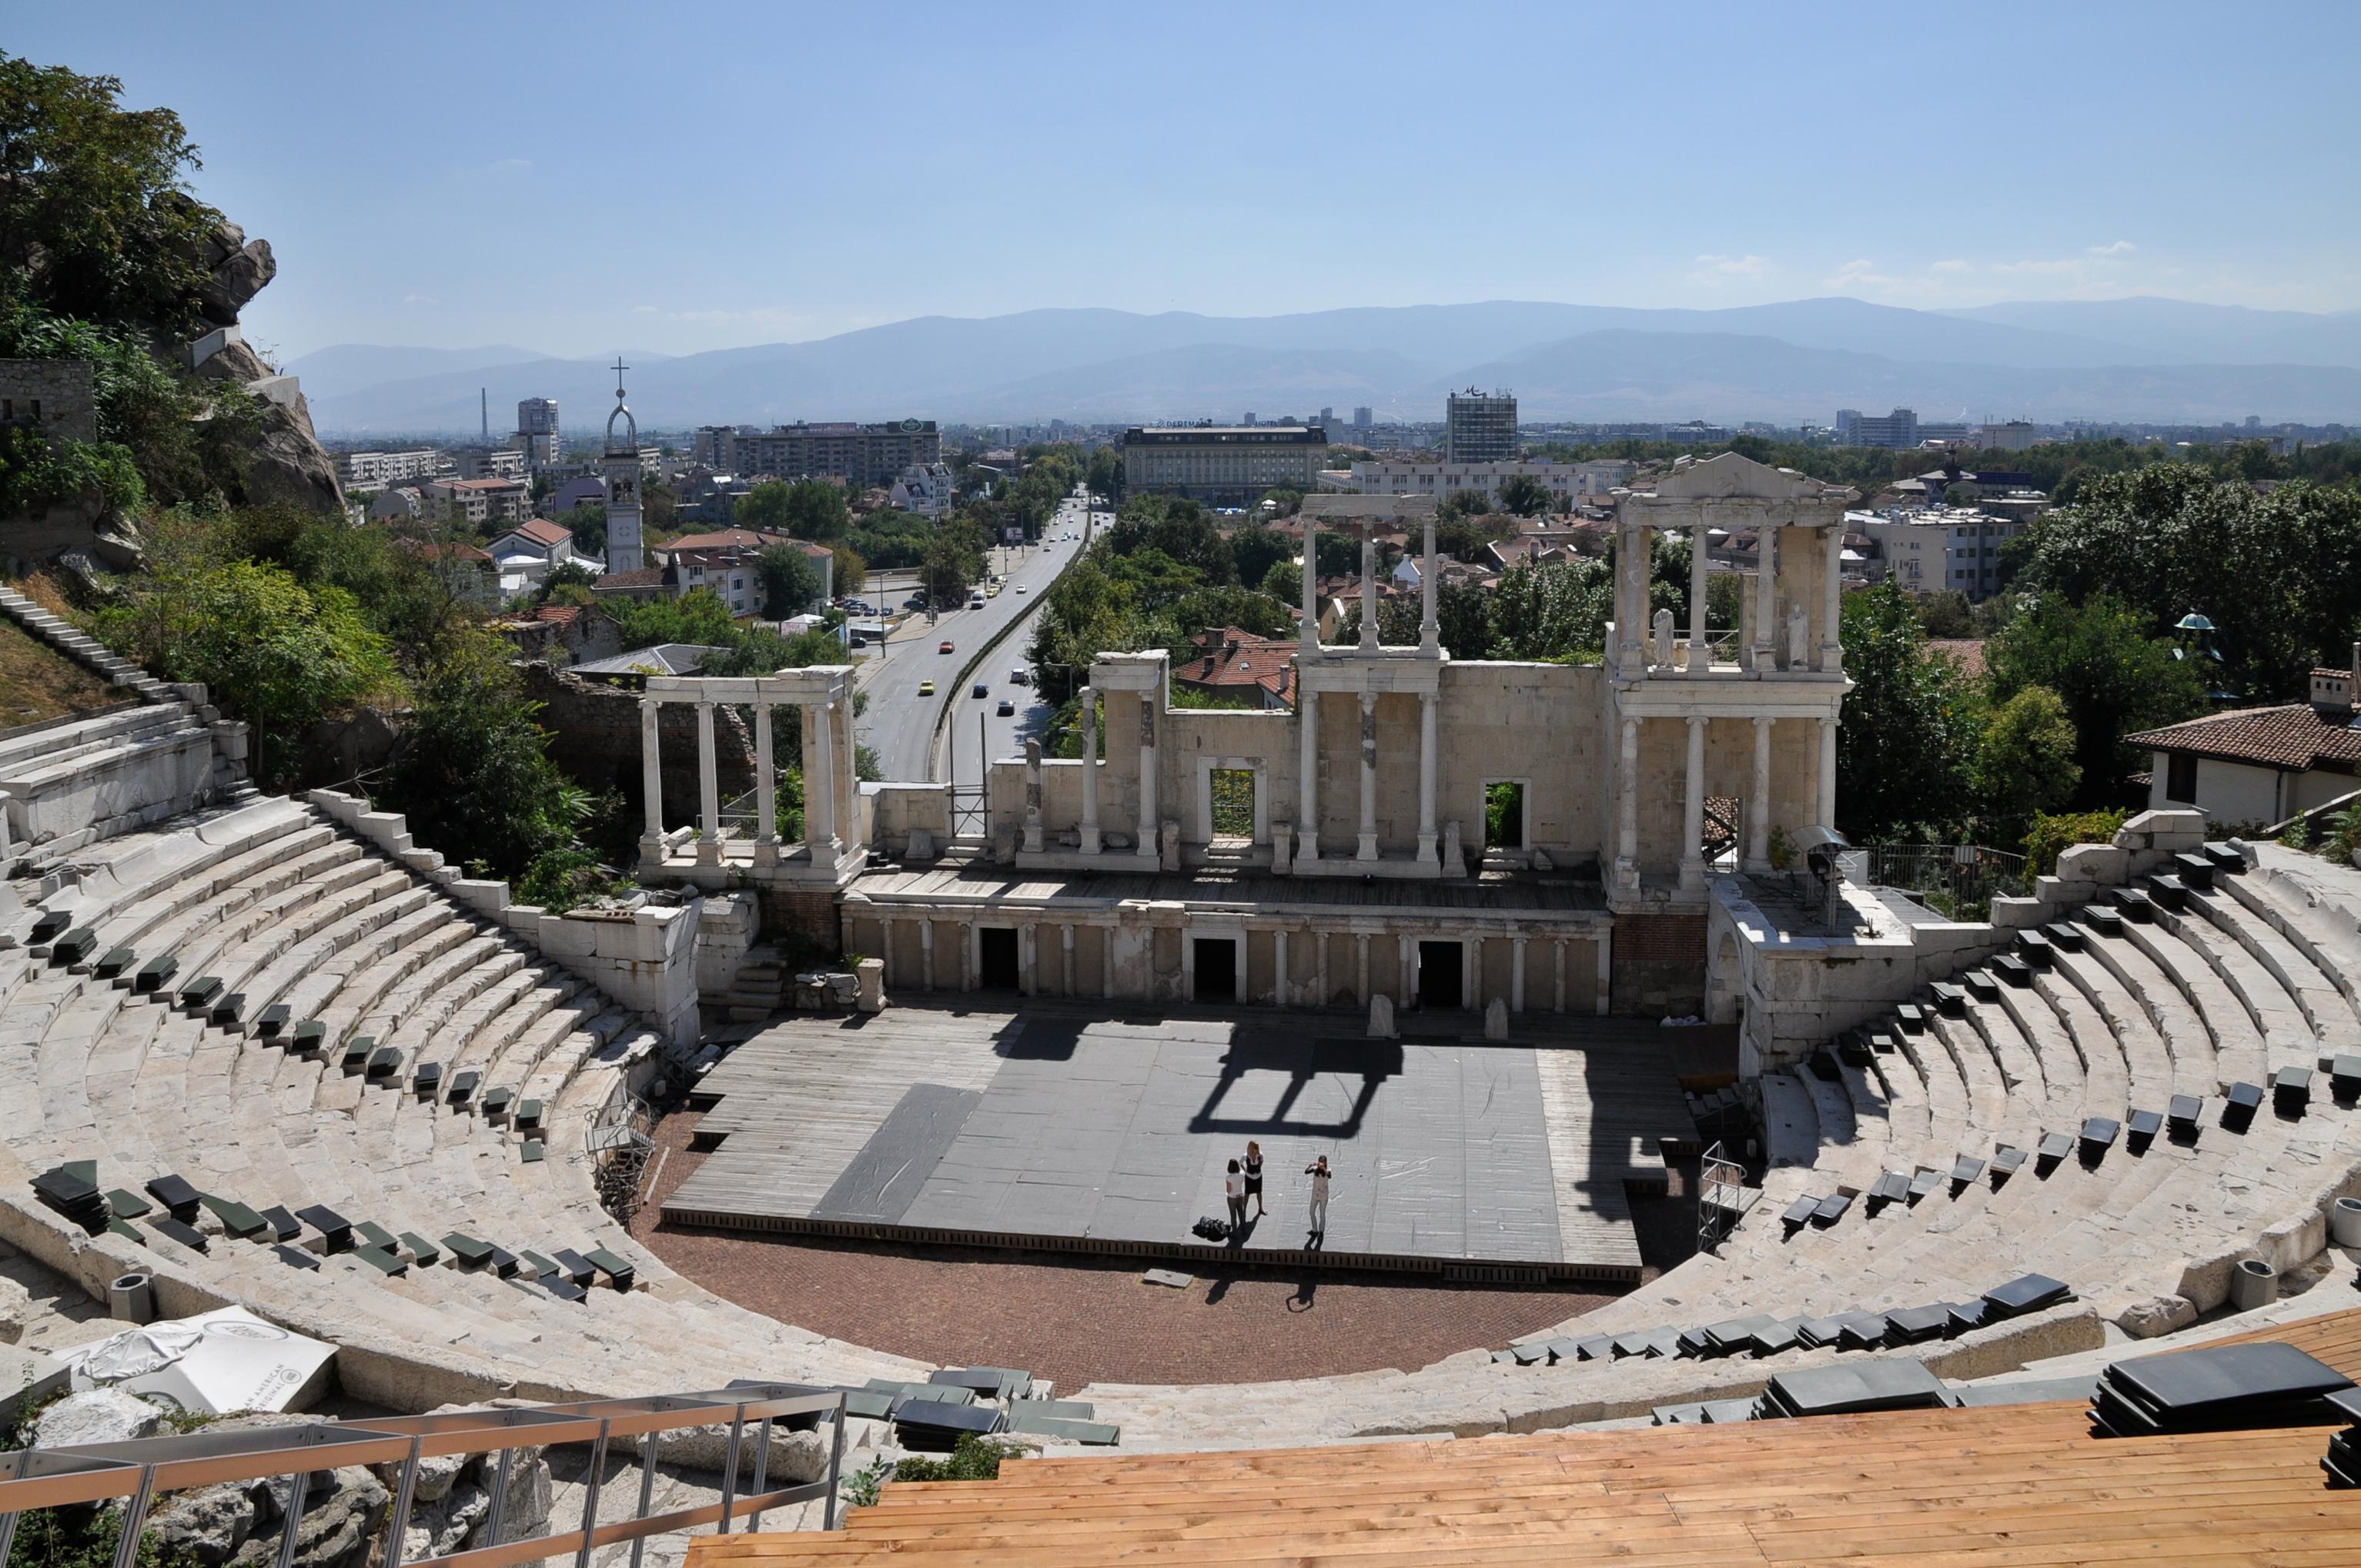 4.3.3.3. Plovdiv Roman Theater